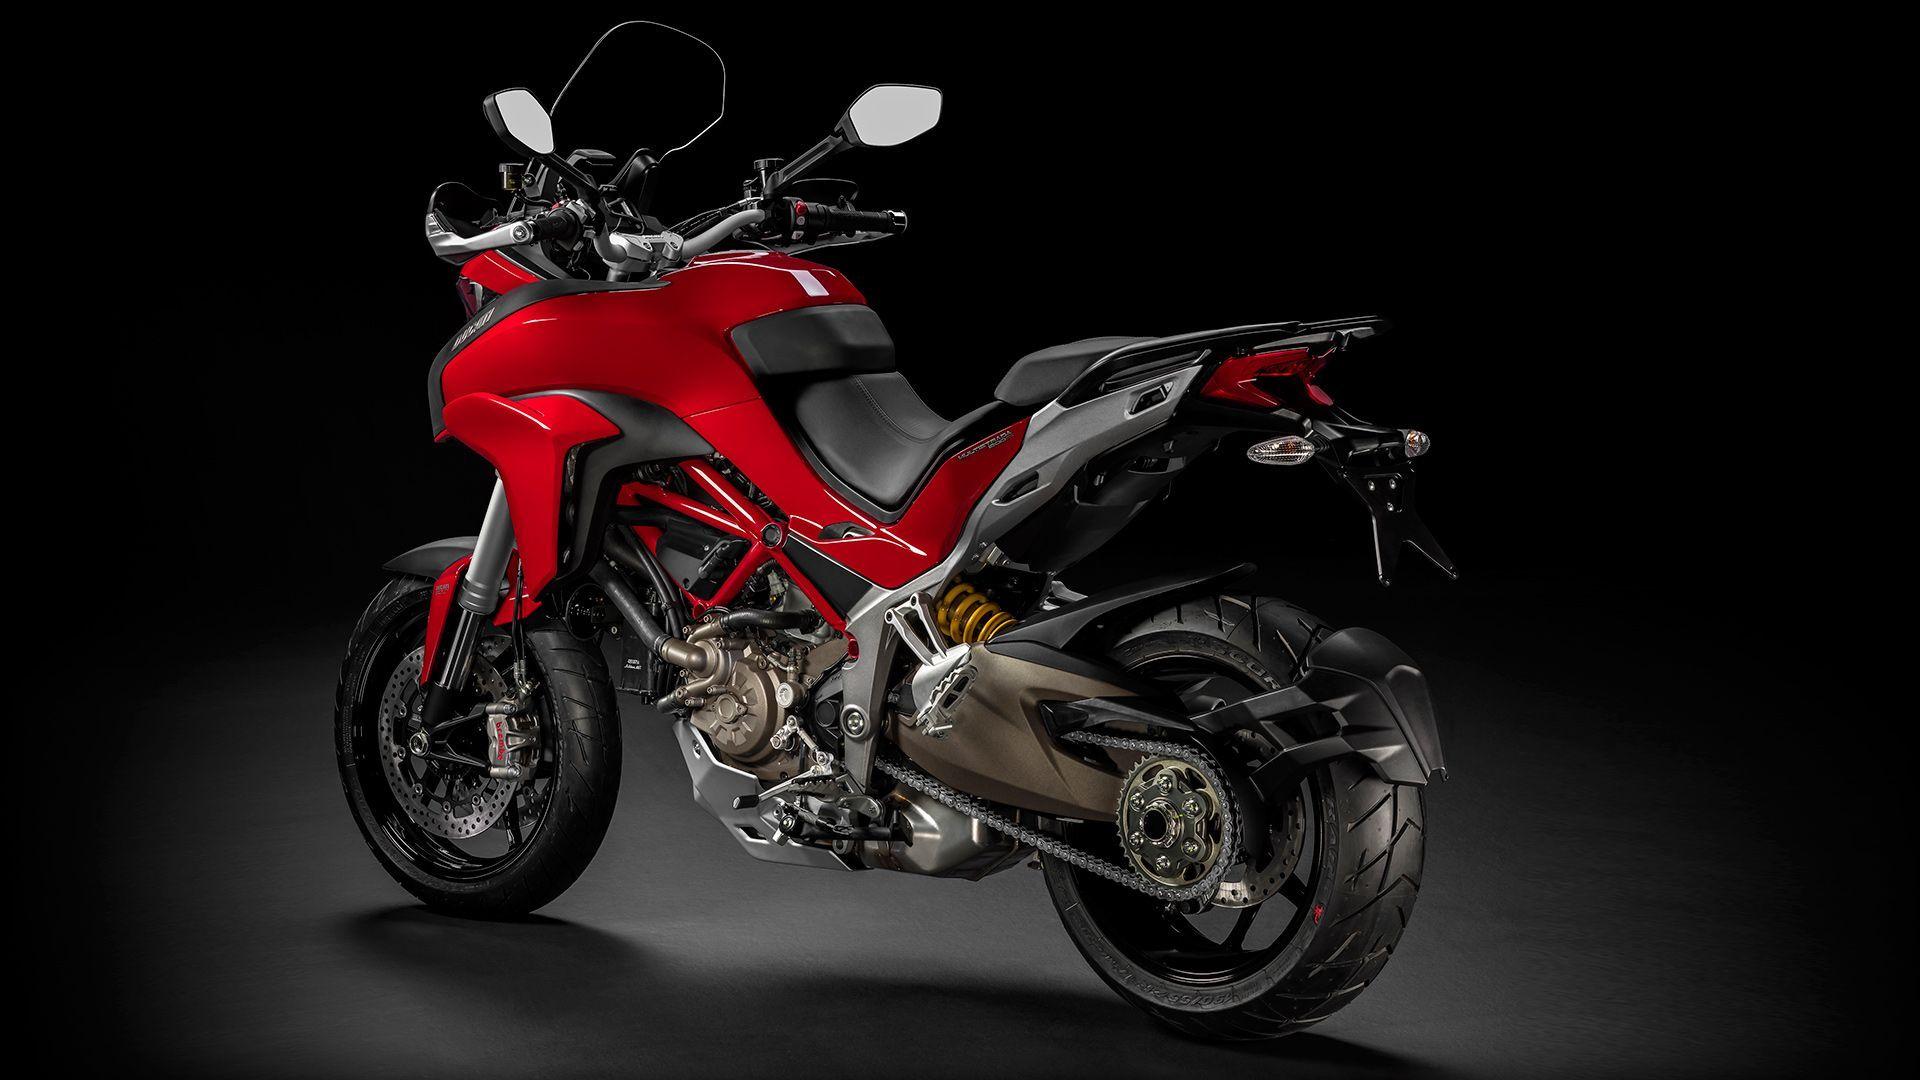 2015 Ducati MULTISTRADA 1200 | Multistrada 1200 S - Rear Side Shot